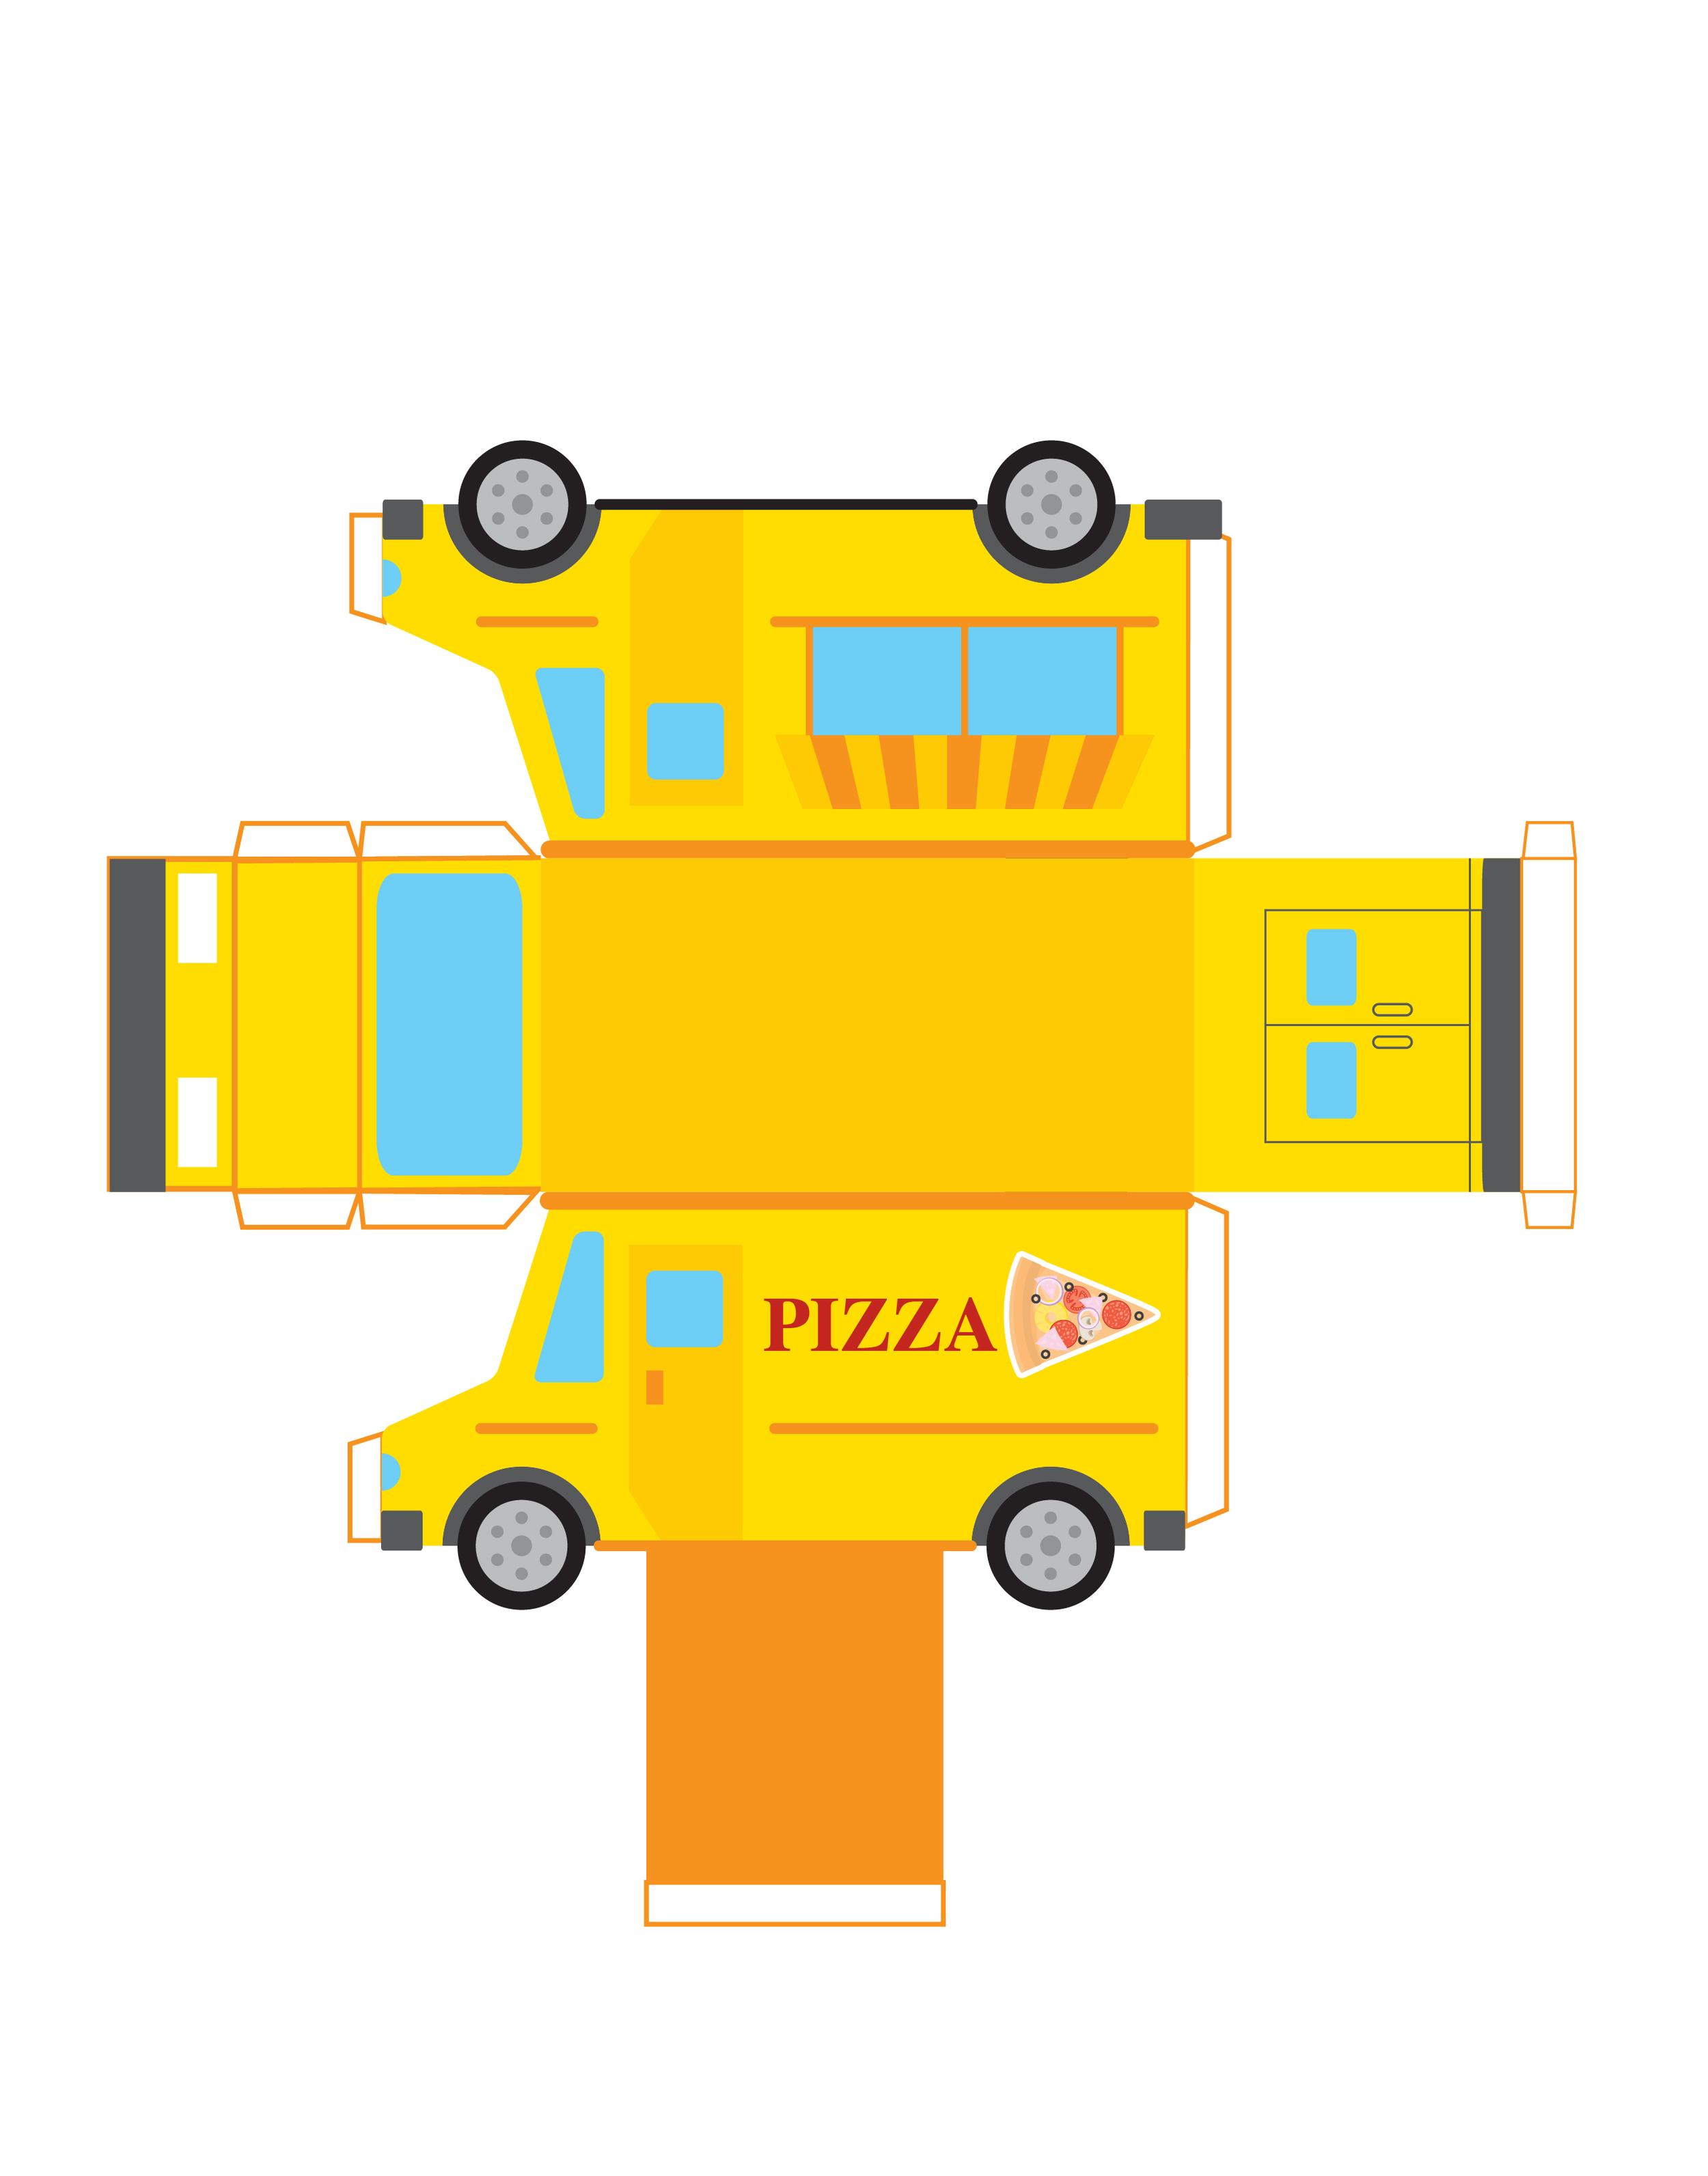 Food Truck Print Outs-04.jpg